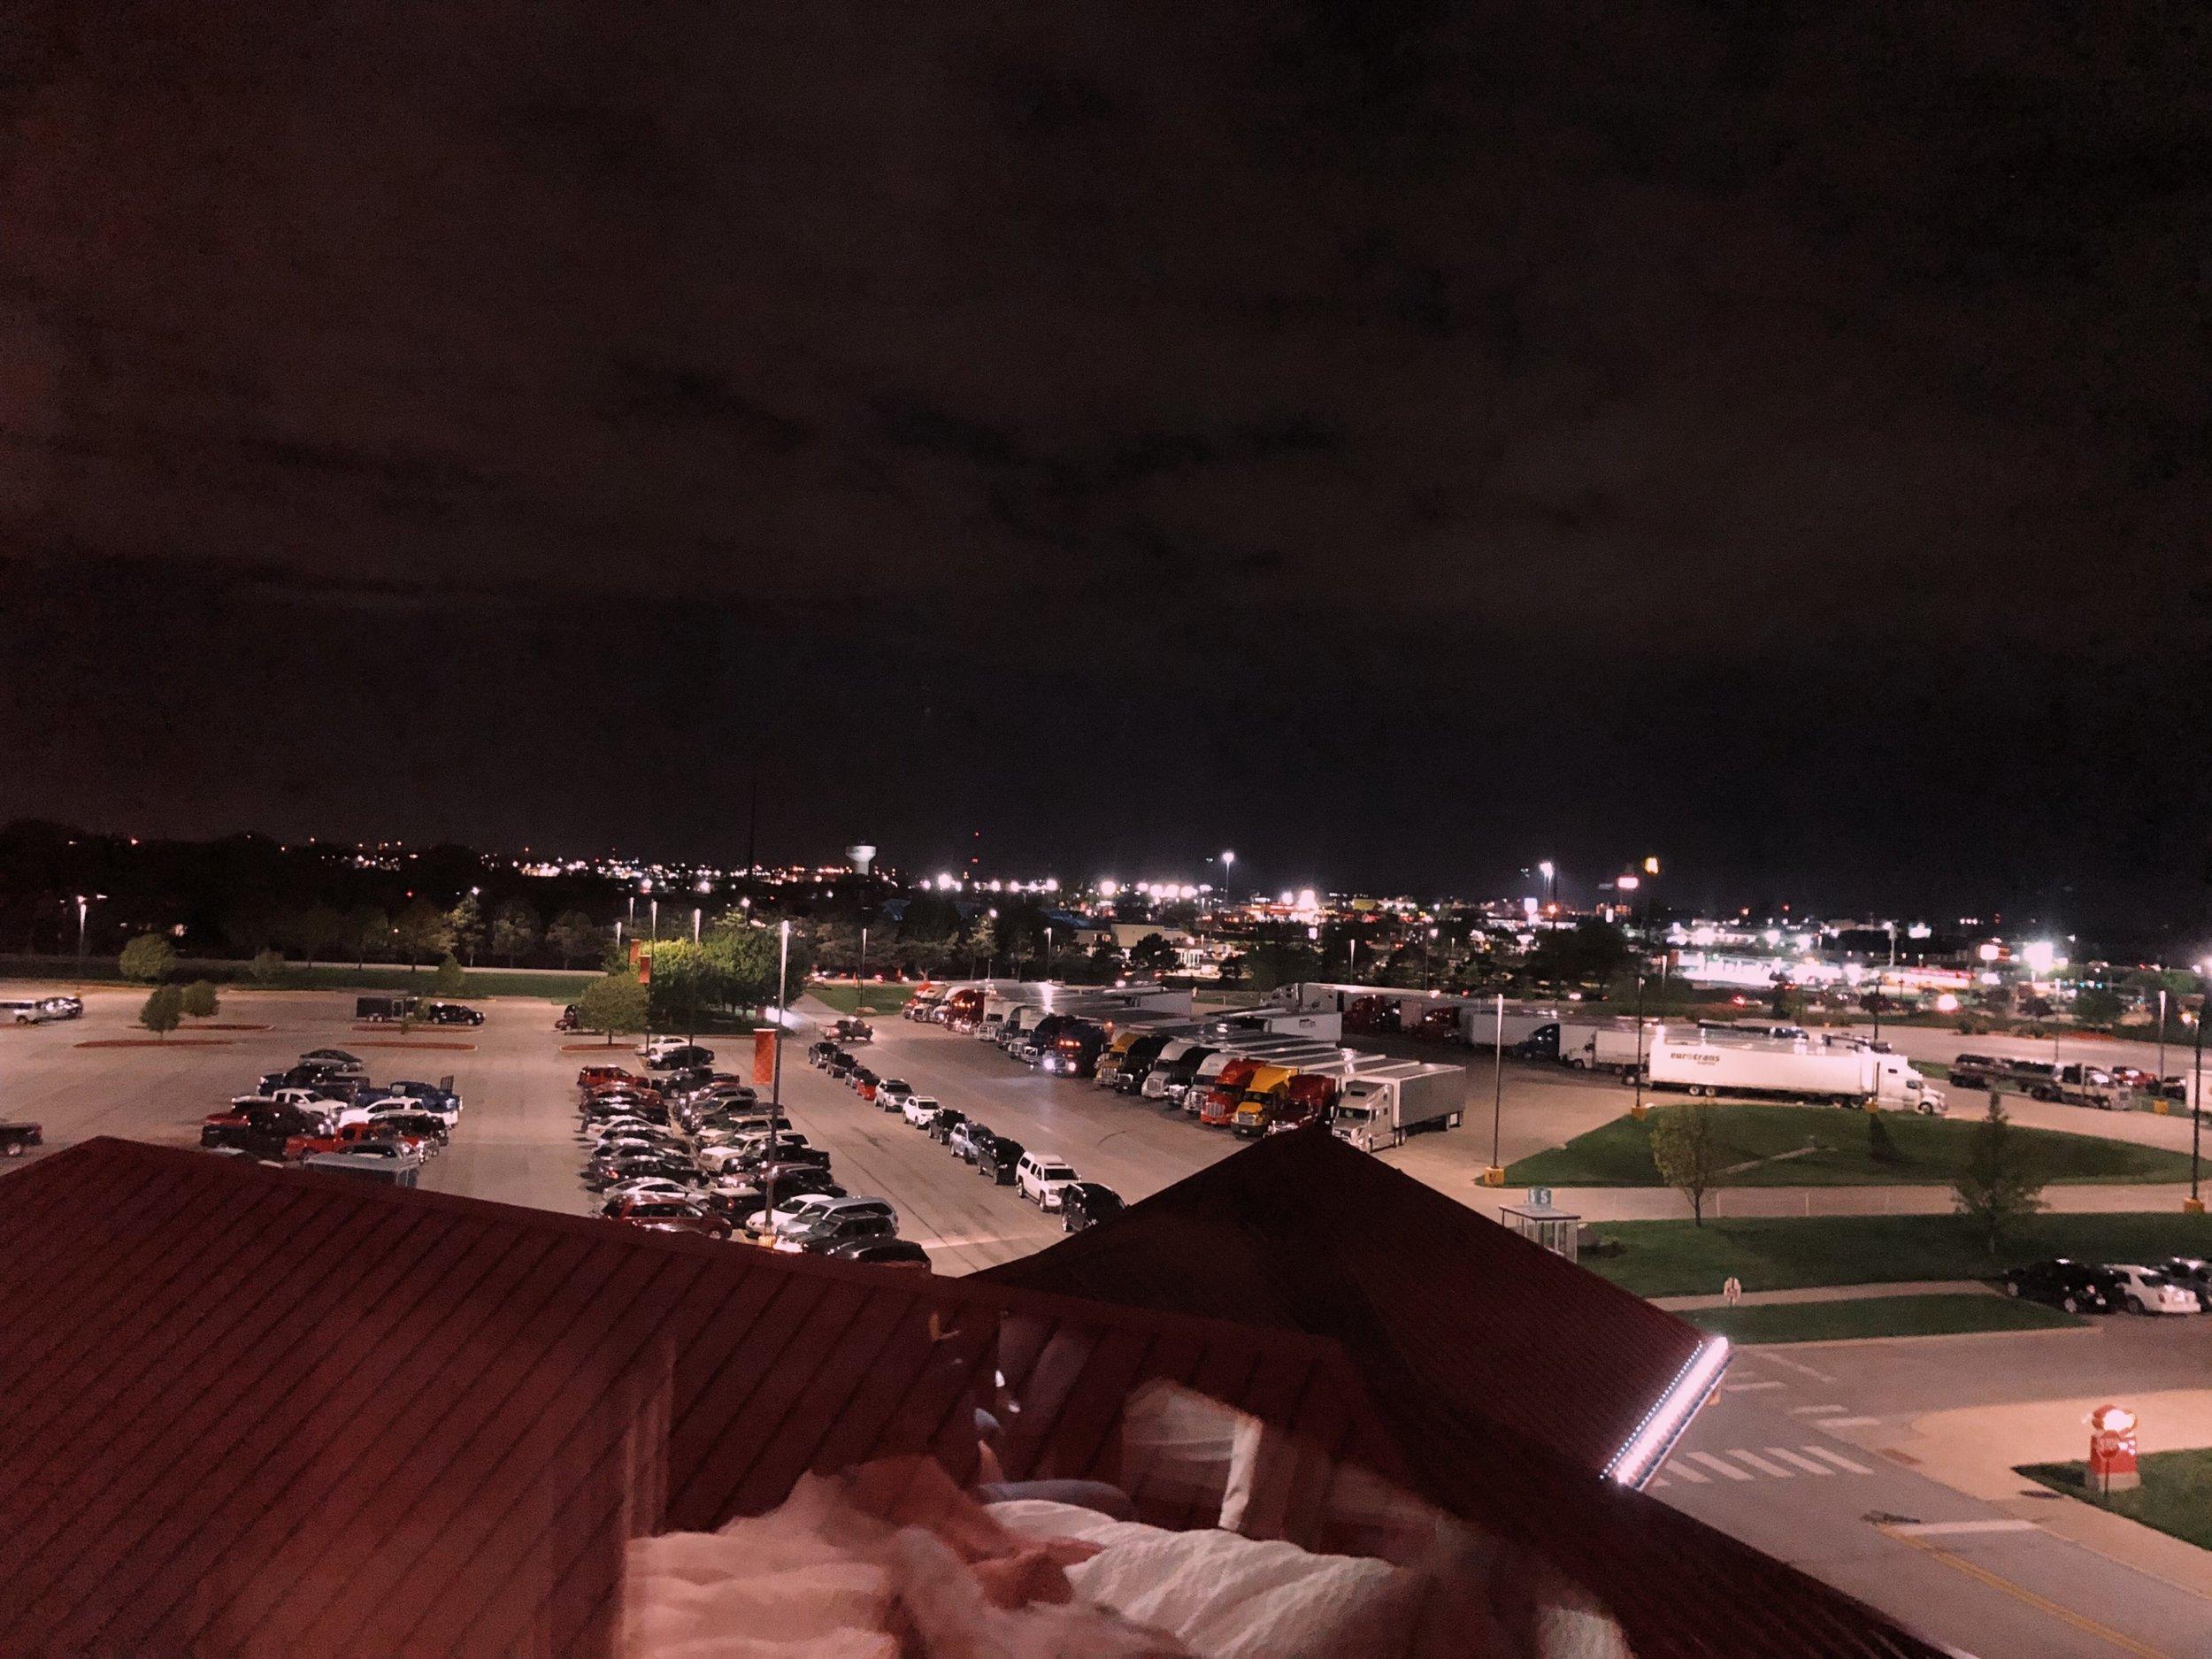 Gotta love that view! -